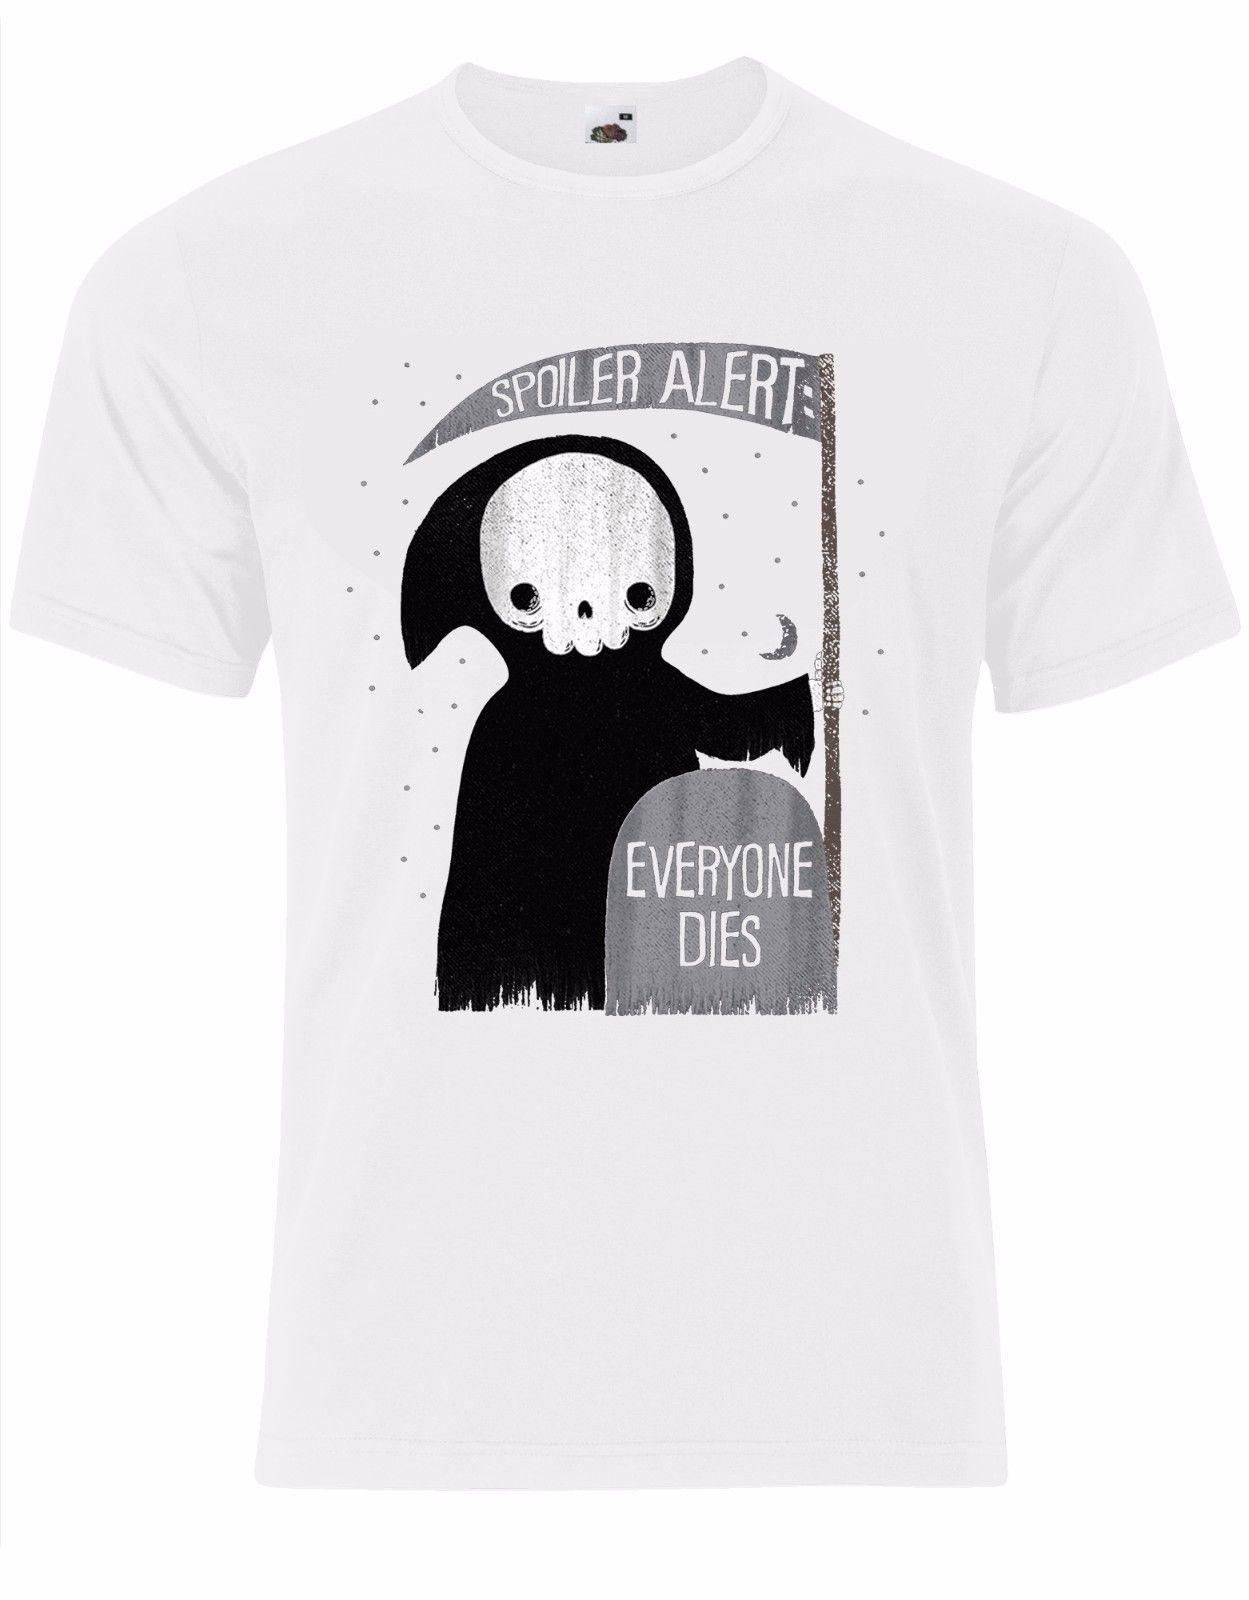 Spoiler alerta todo el mundo muere divertido Halloween muerte Grim Reaper Mens camiseta AL70 Cartoon camiseta hombres Unisex nueva moda camiseta